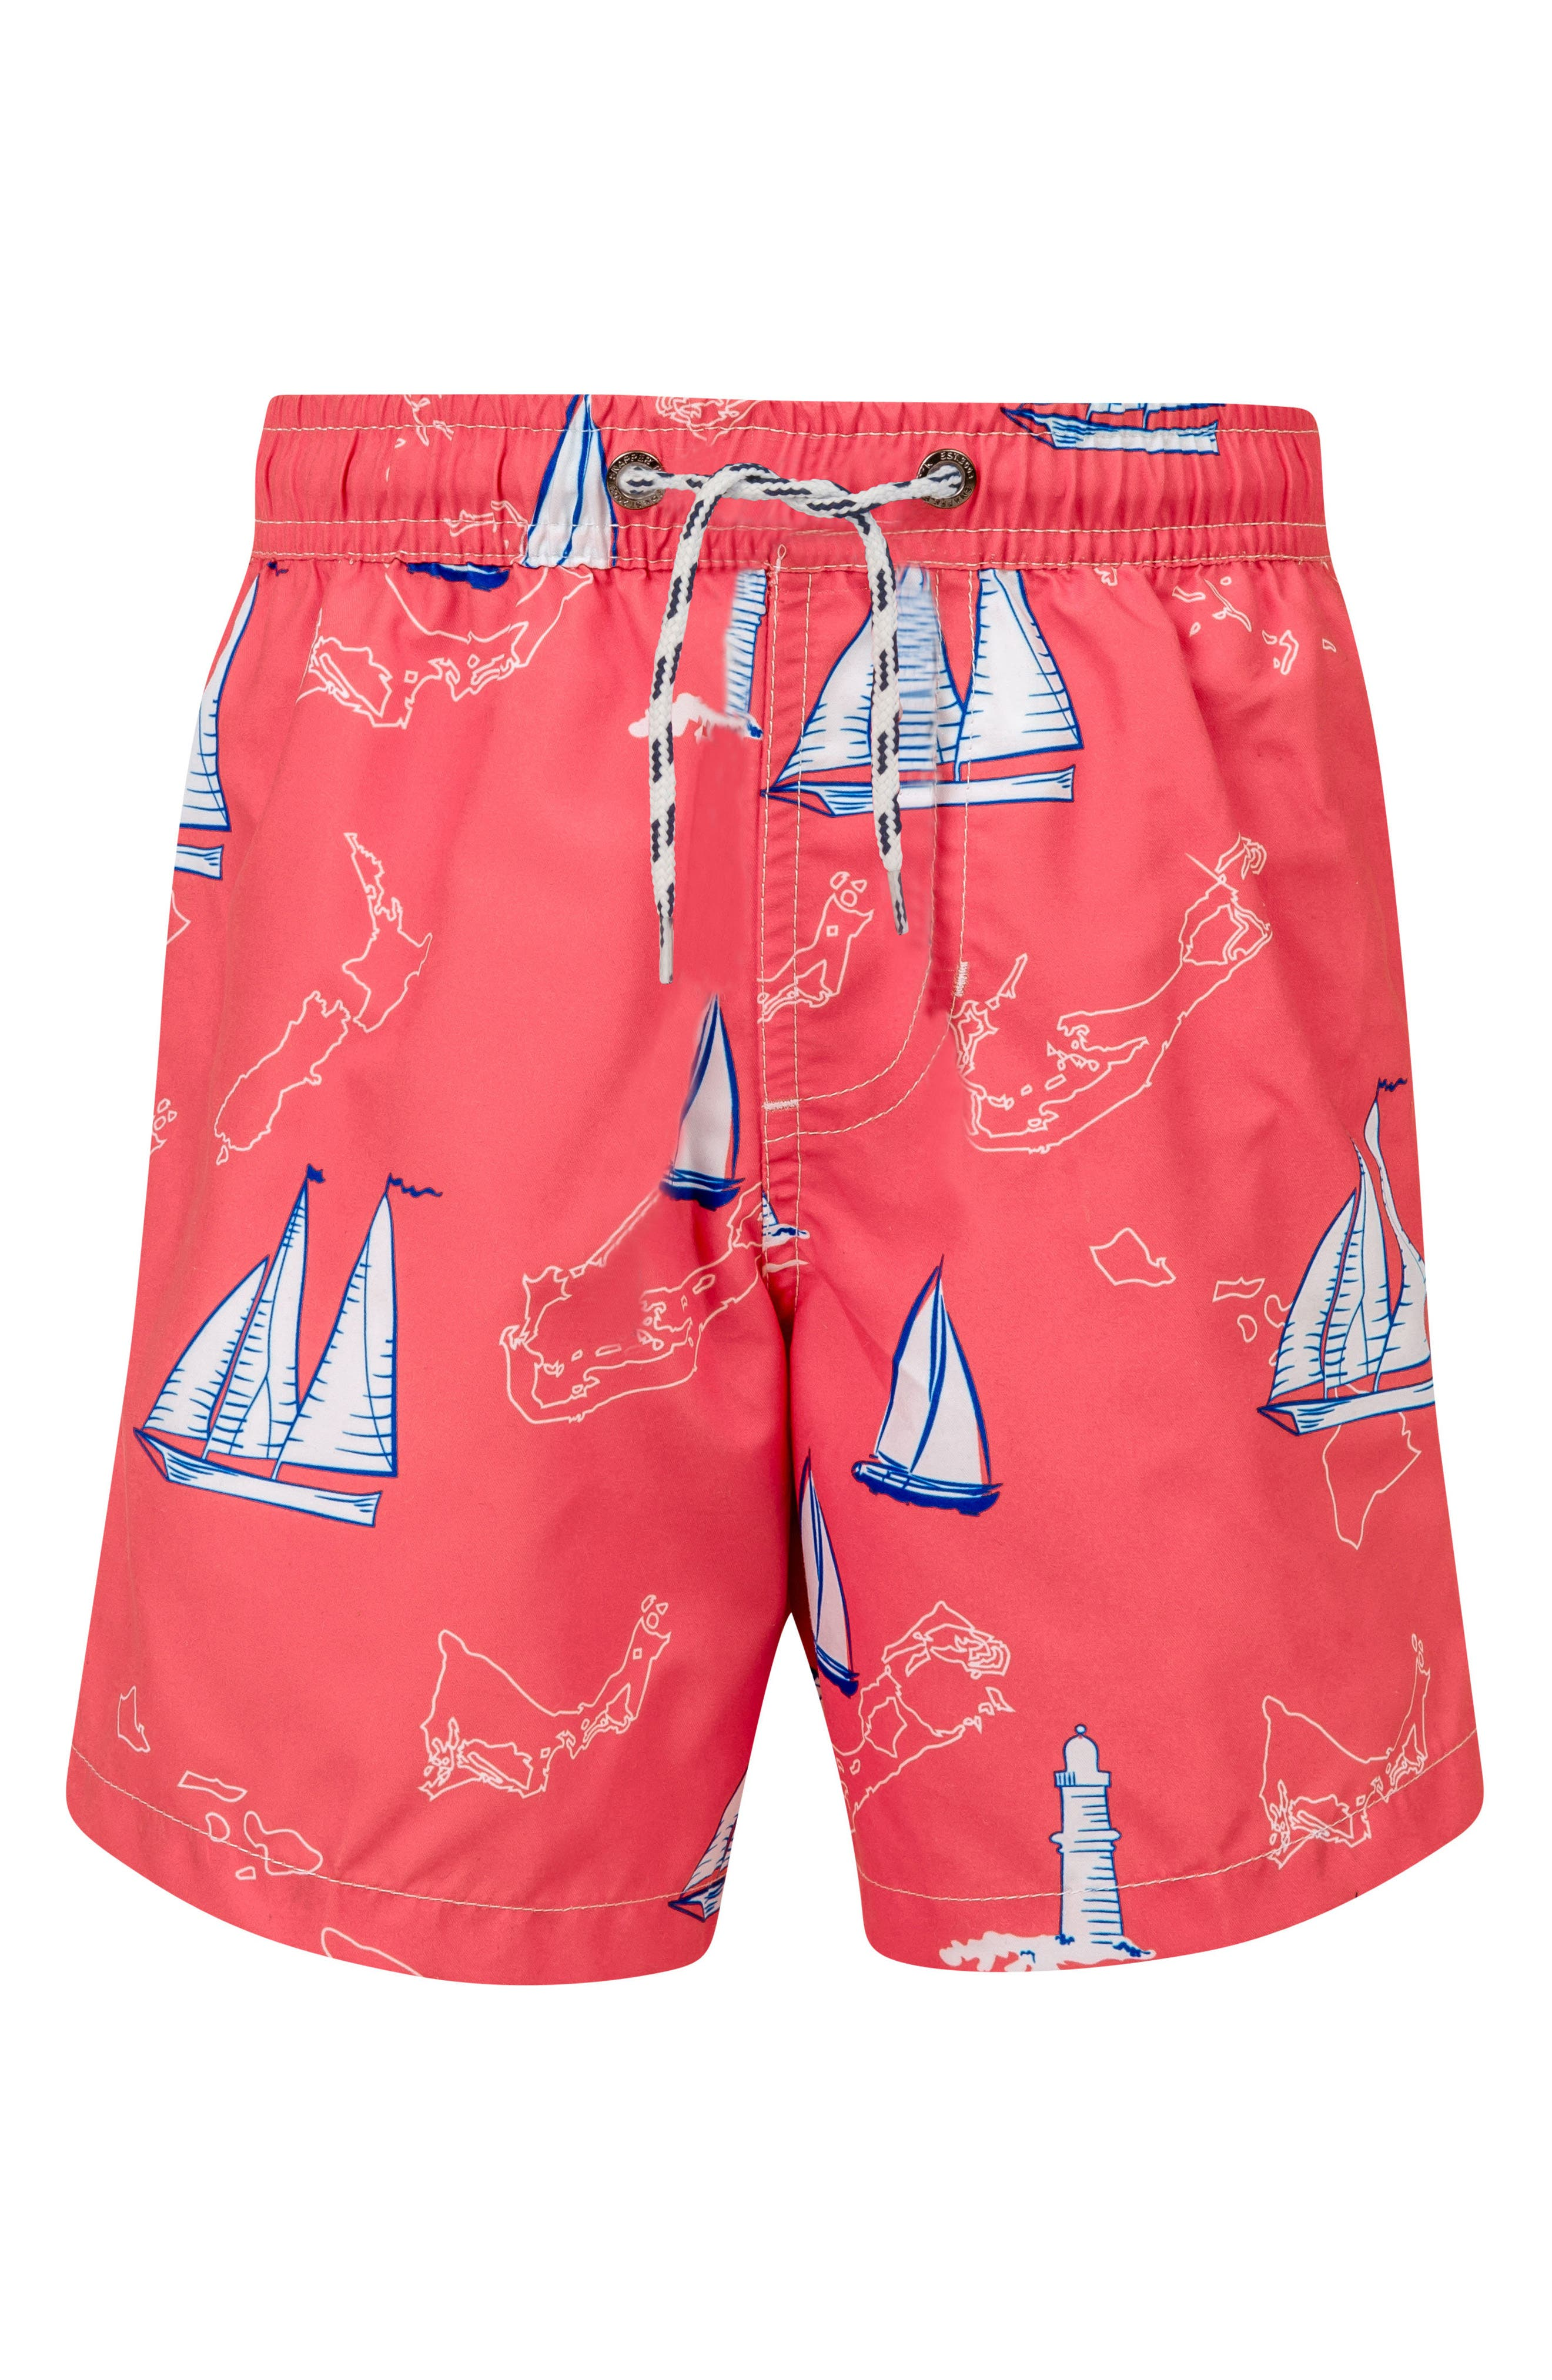 SNAPPER ROCK,                             Island Sail Swim Trunks,                             Main thumbnail 1, color,                             RED MULTI